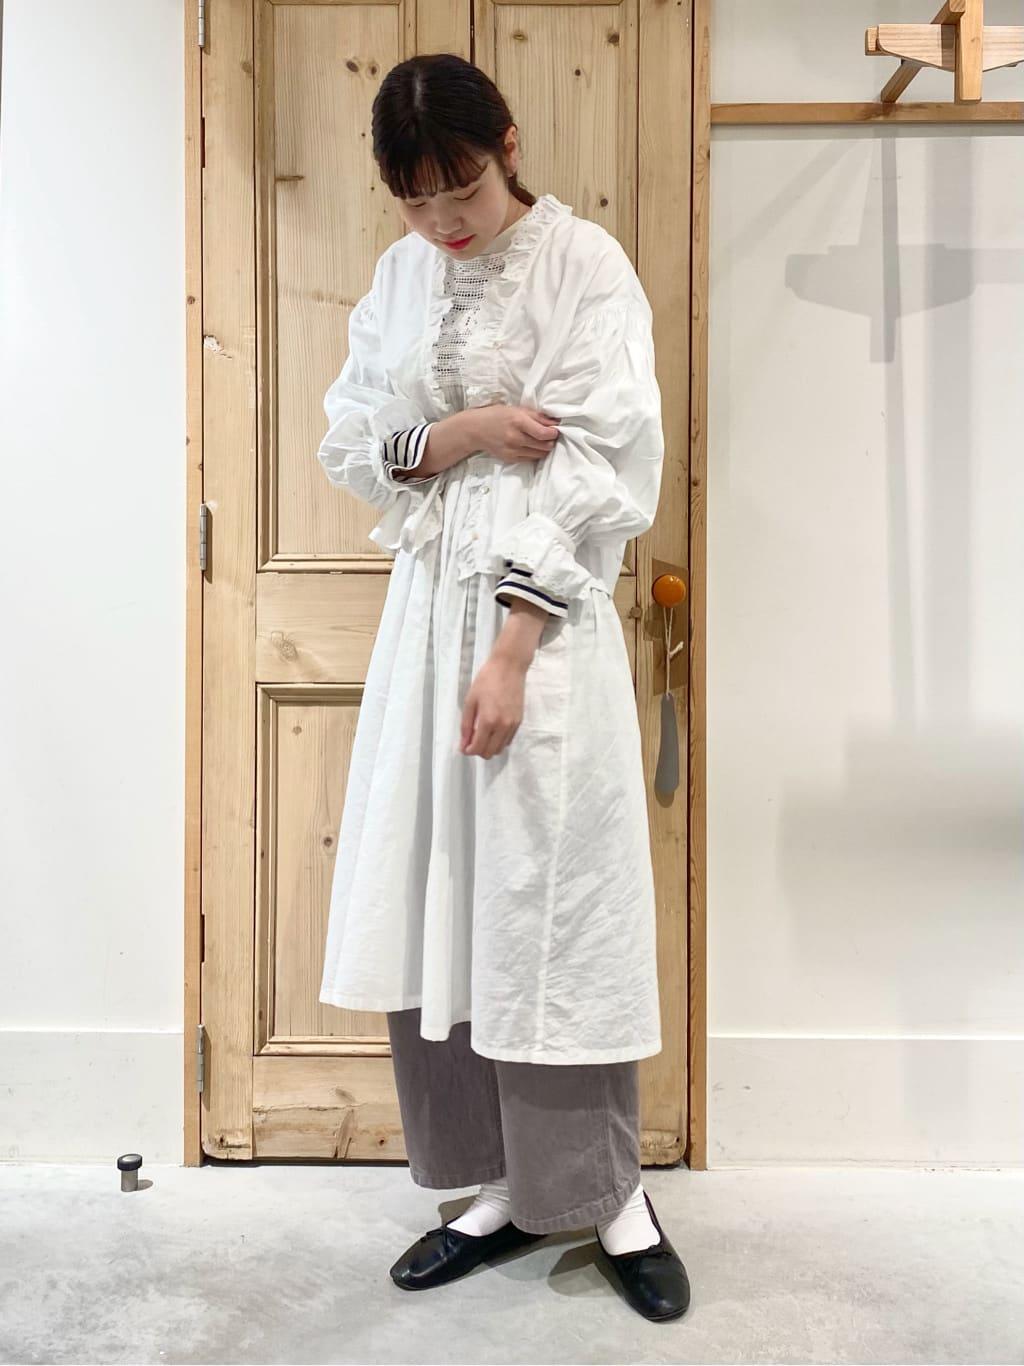 Malle chambre de charme 調布パルコ 身長:167cm 2021.09.16